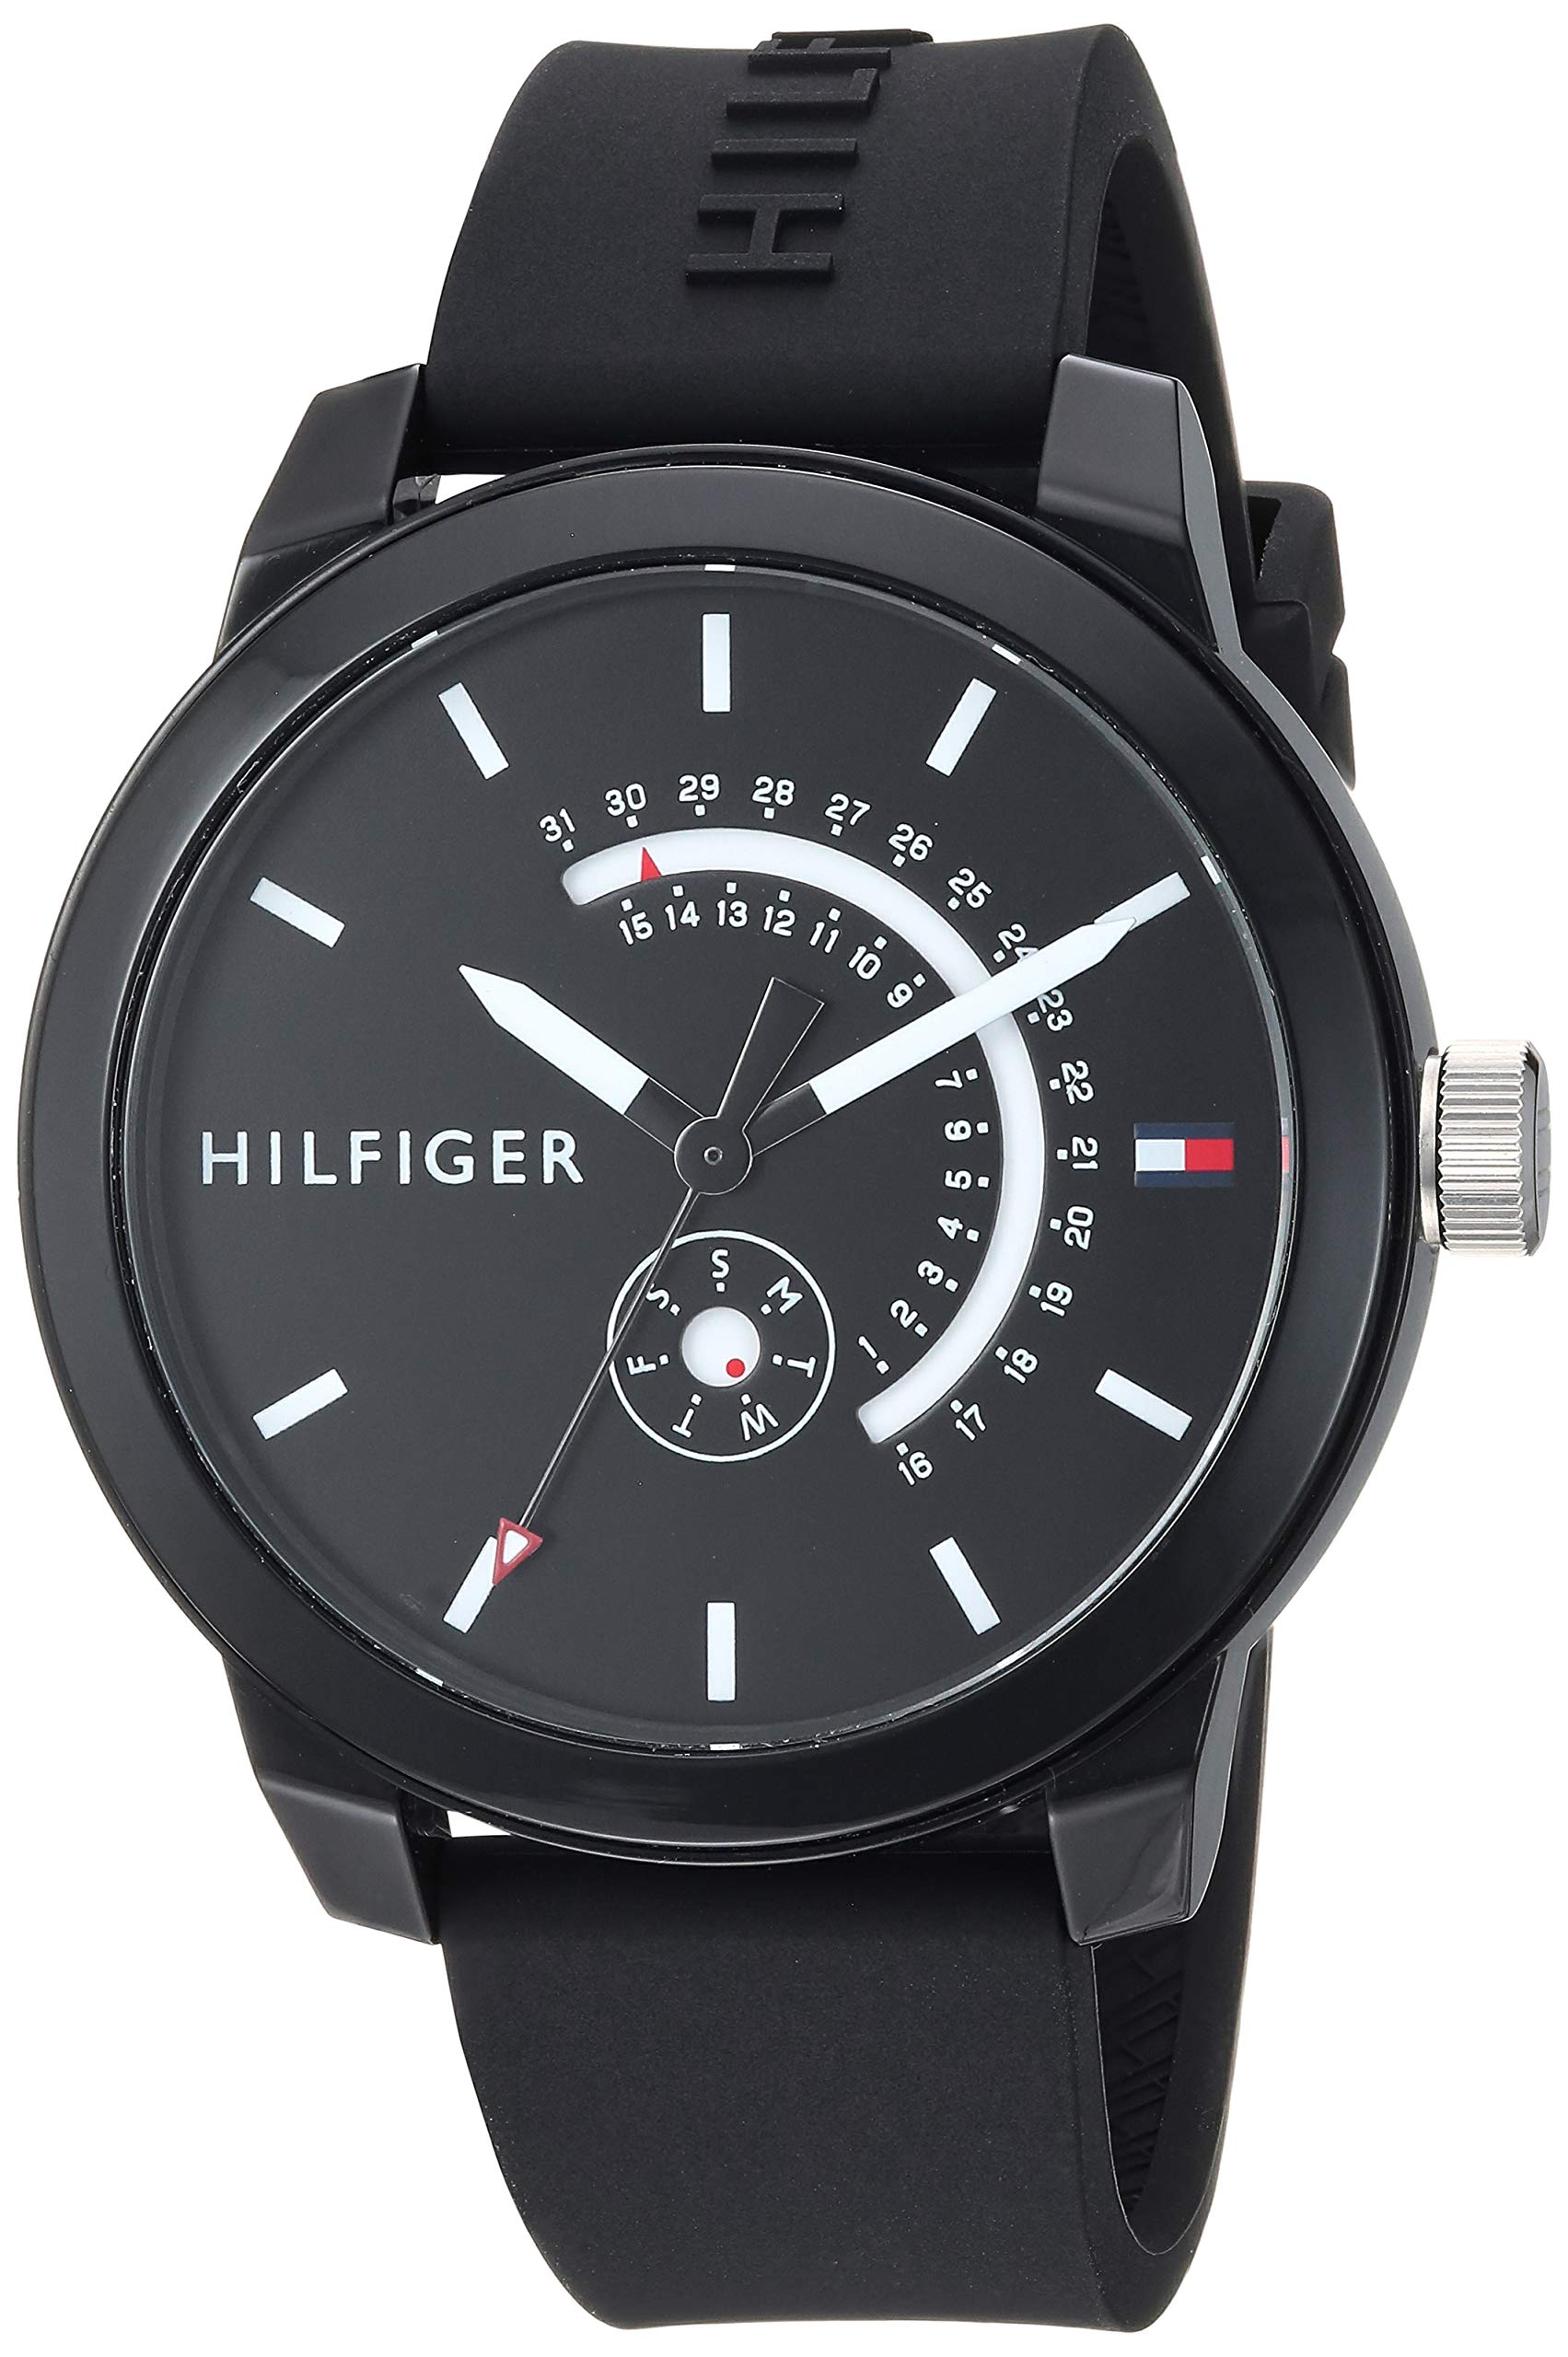 Tommy Hilfiger Men's Denim Quartz Watch with Silicone Strap, Black, 19.4 (Model: 1791483) by Tommy Hilfiger